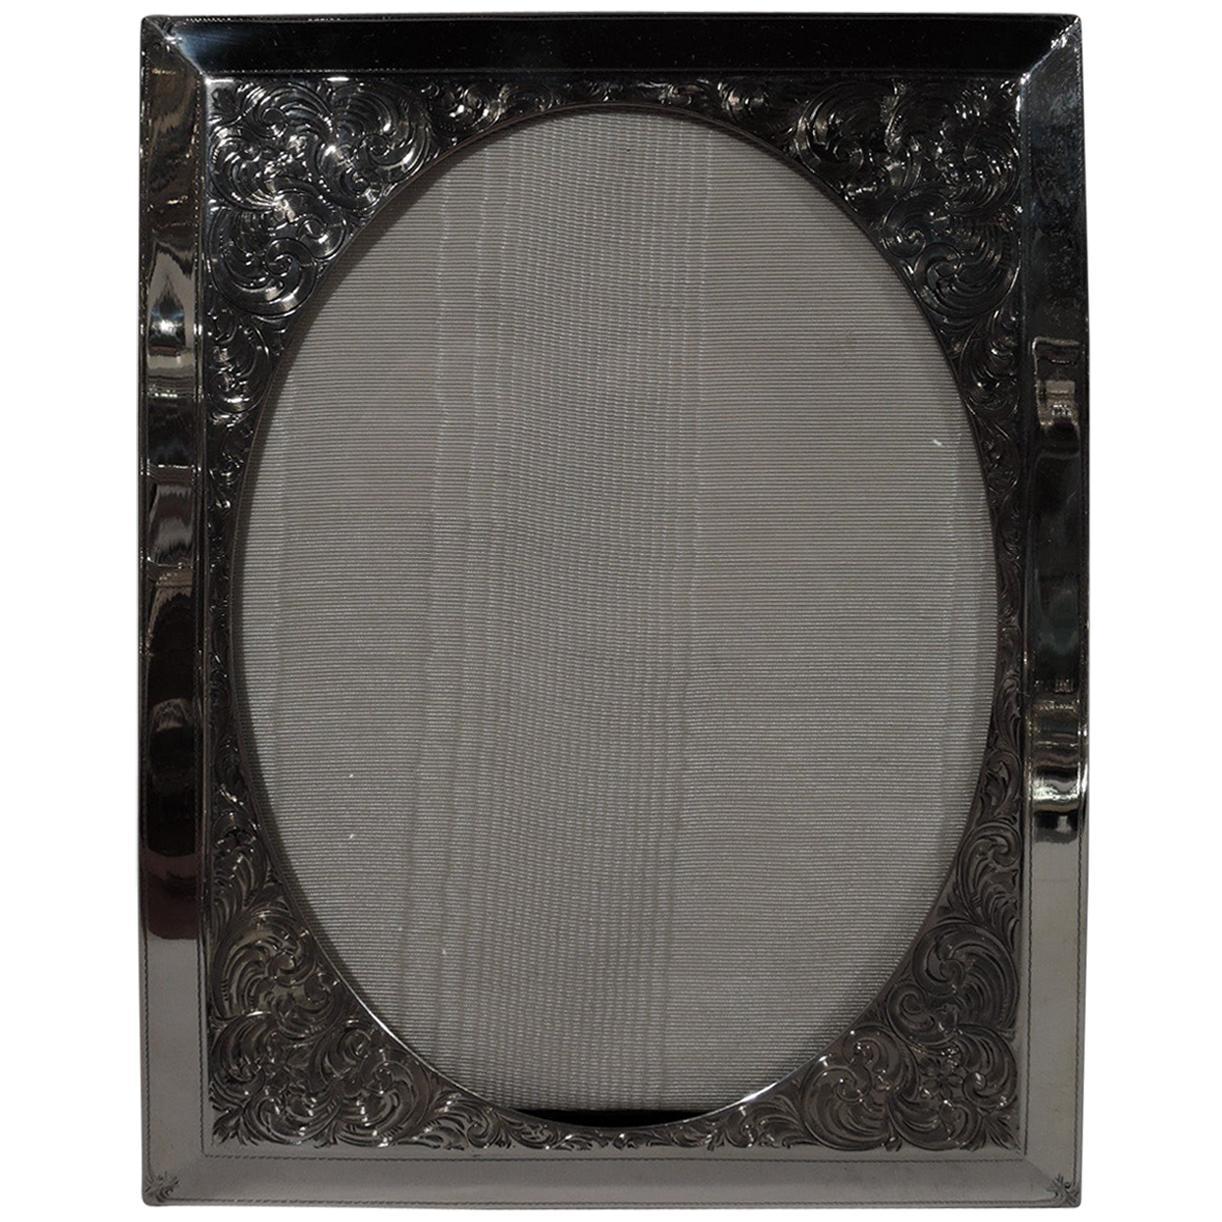 Antique American Art Nouveau Sterling Silver Picture Frame